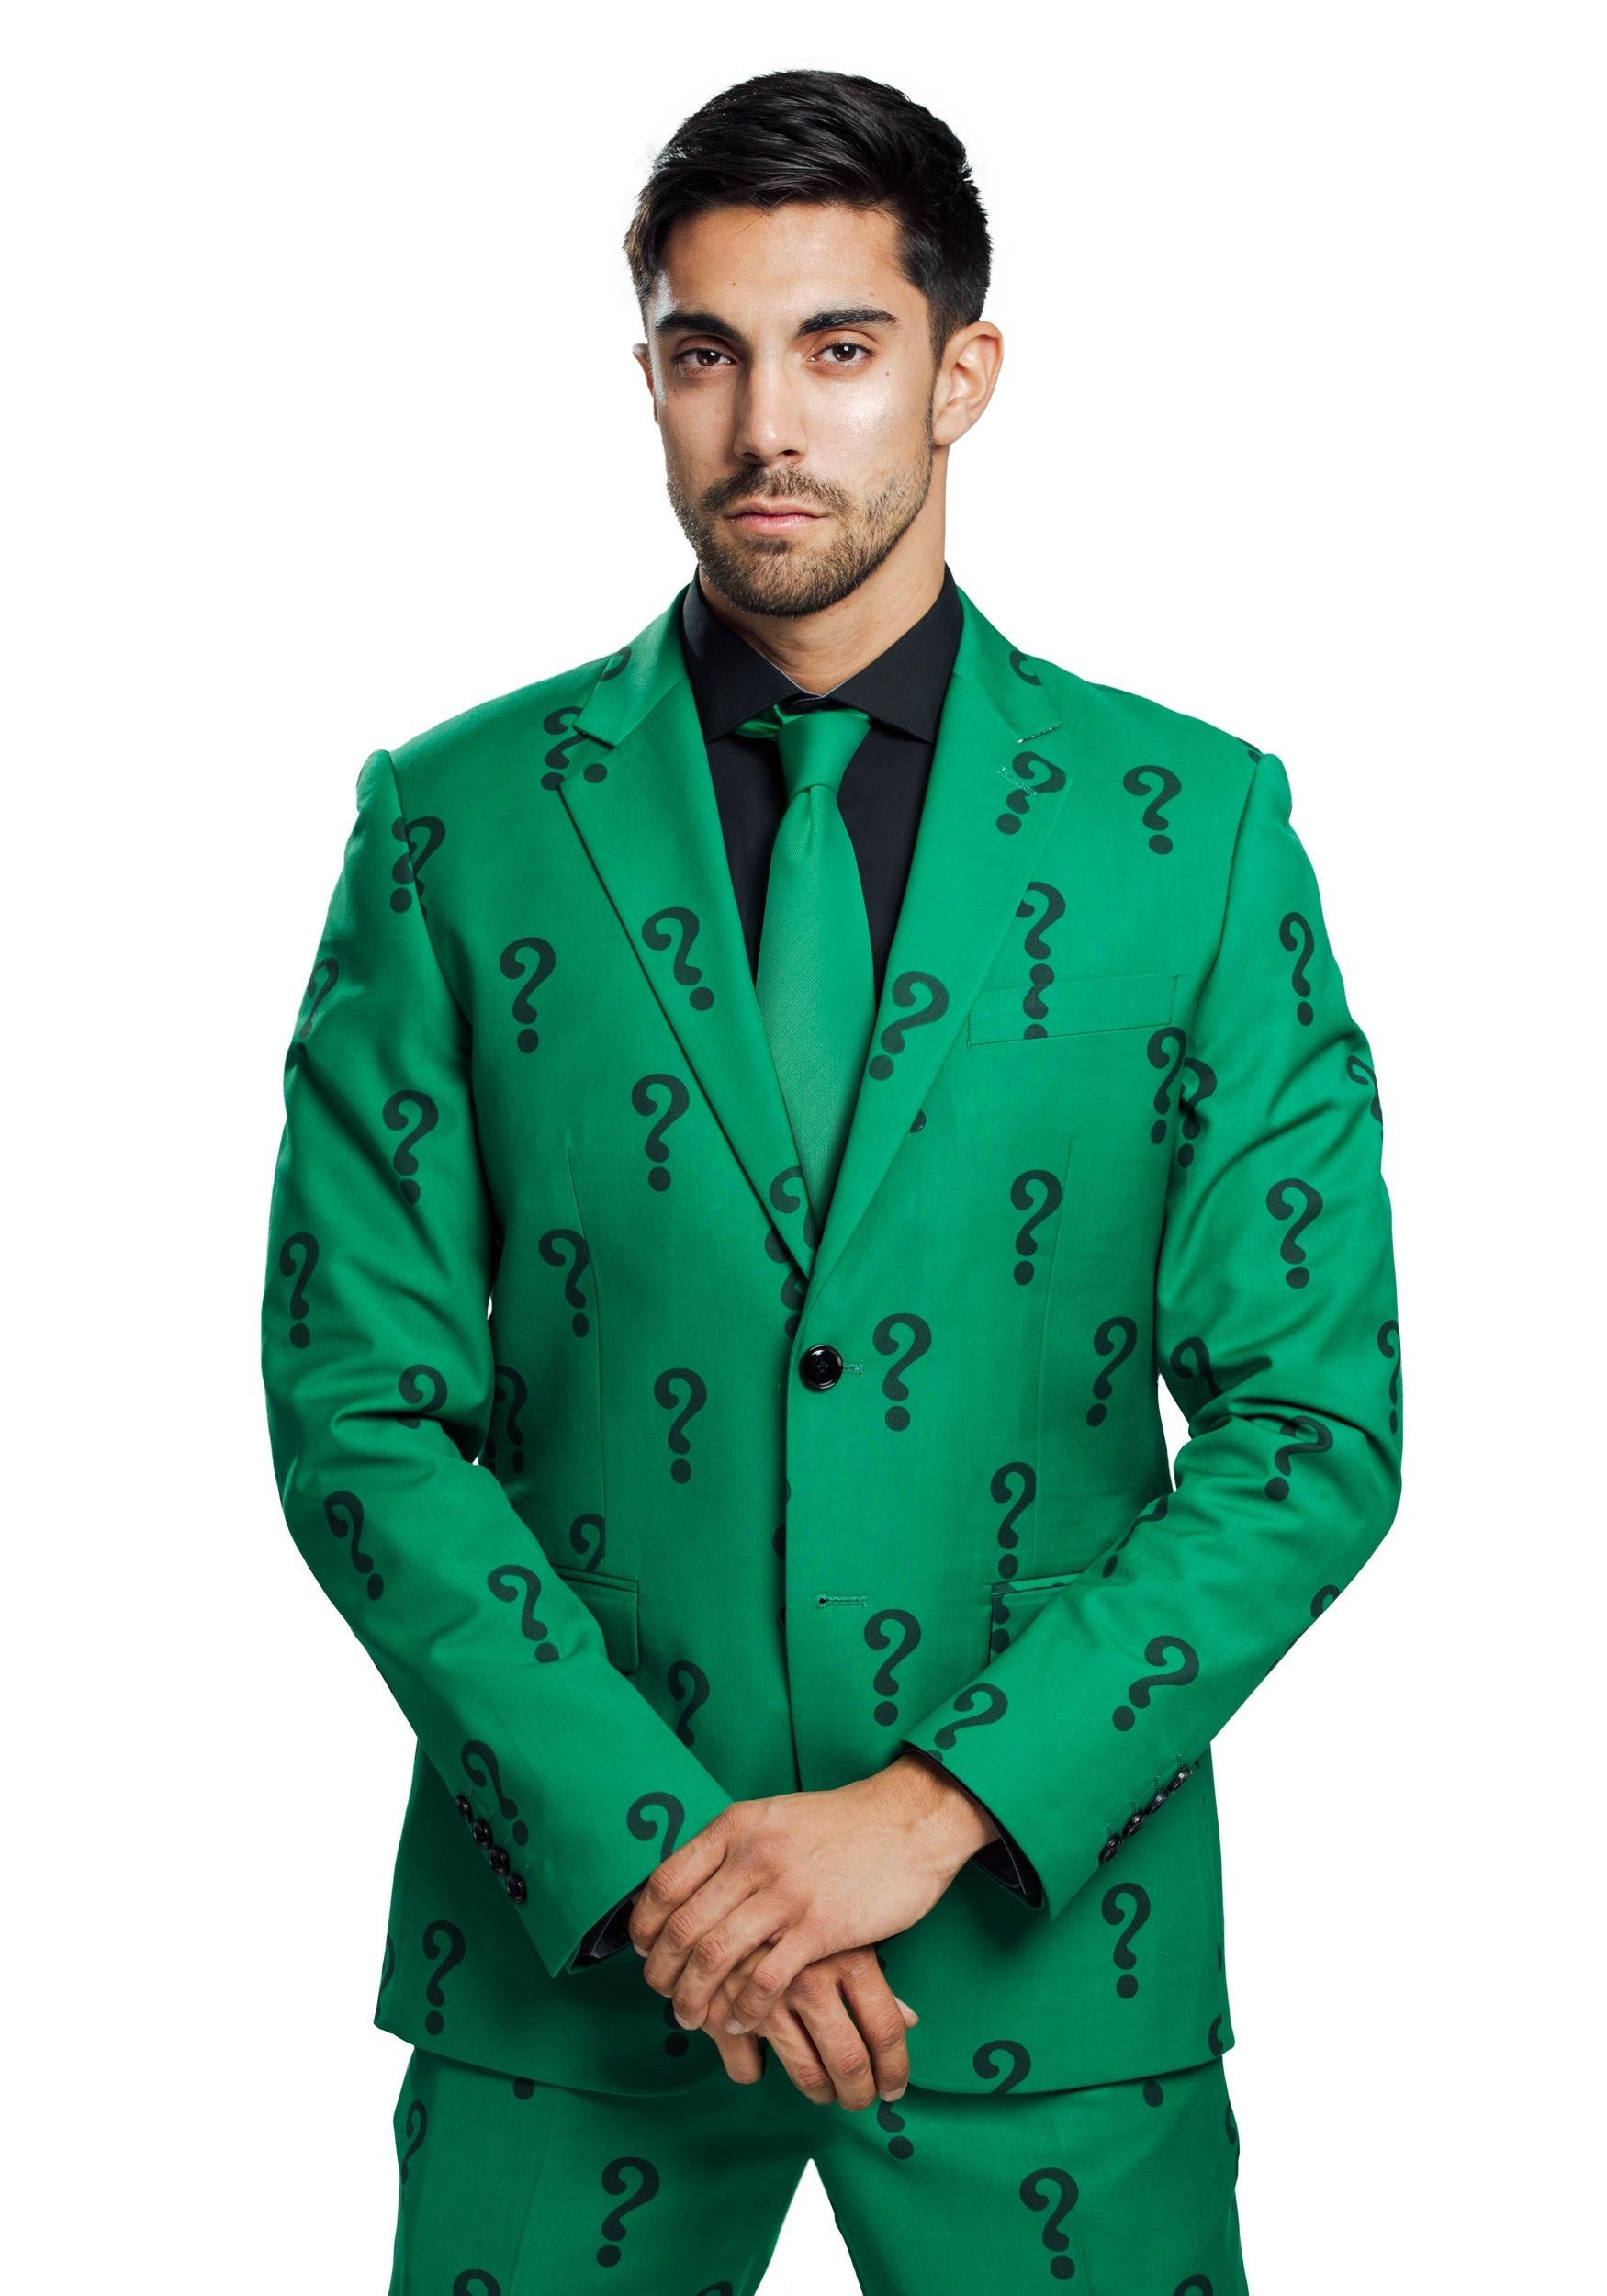 Authentic The Riddler Slim Fit Suit Jacket